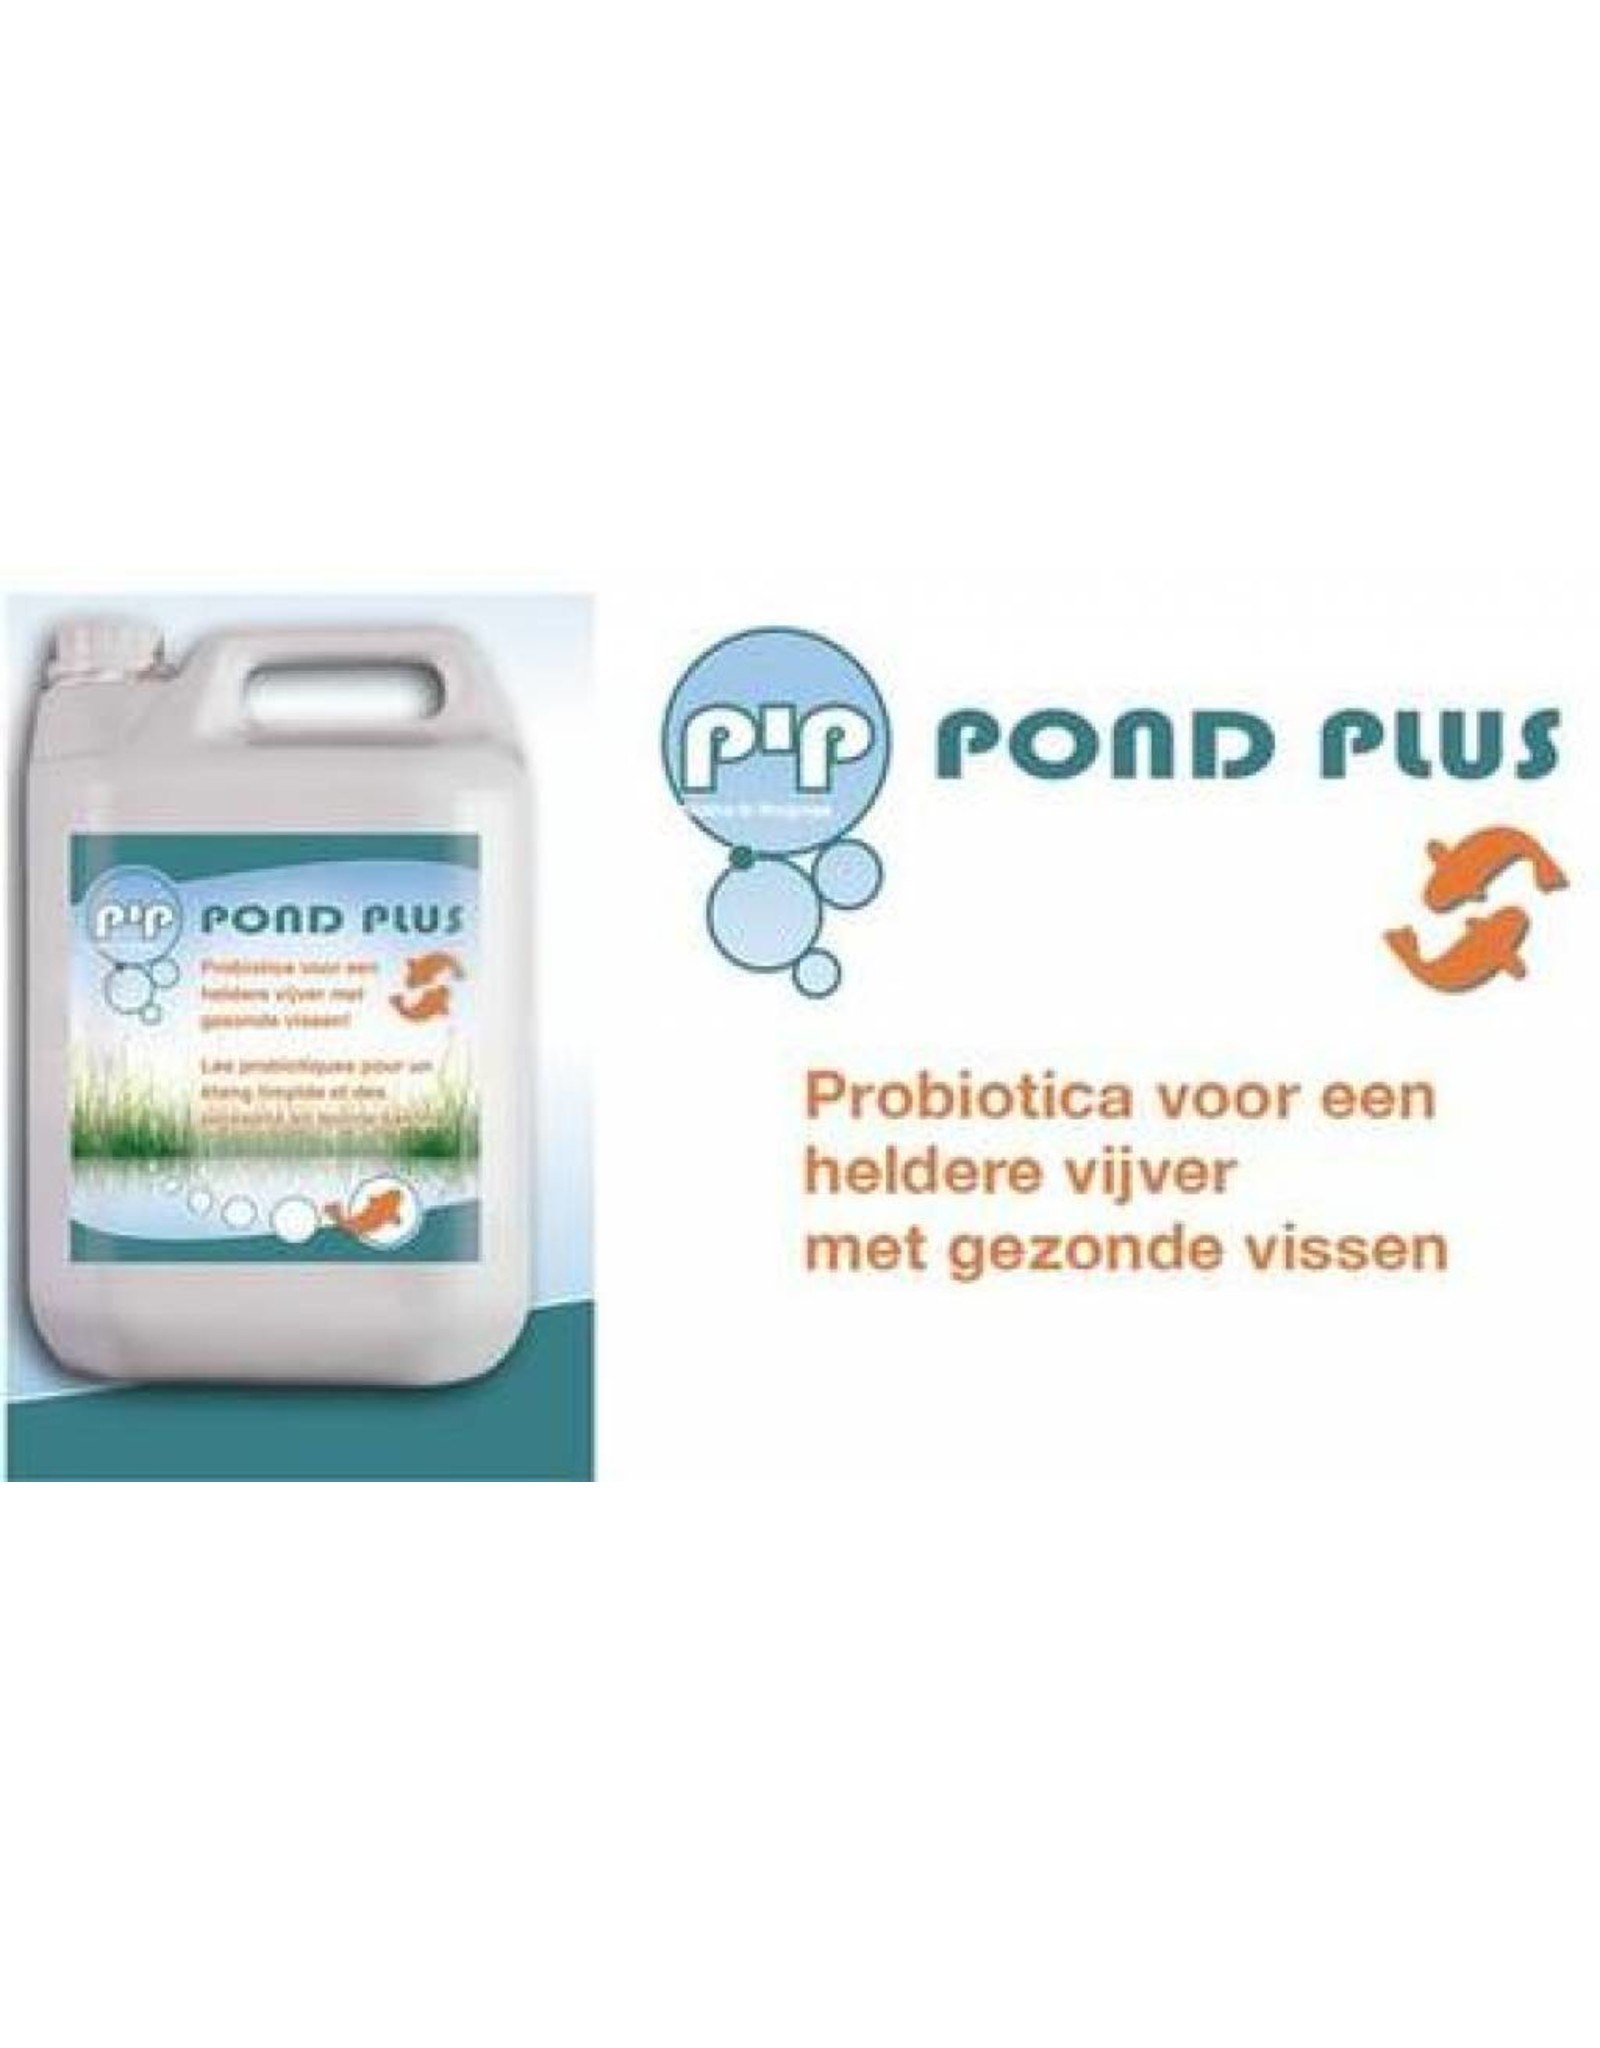 PIP Pond plus PIP Pound Plus - Probiotics for your pond.